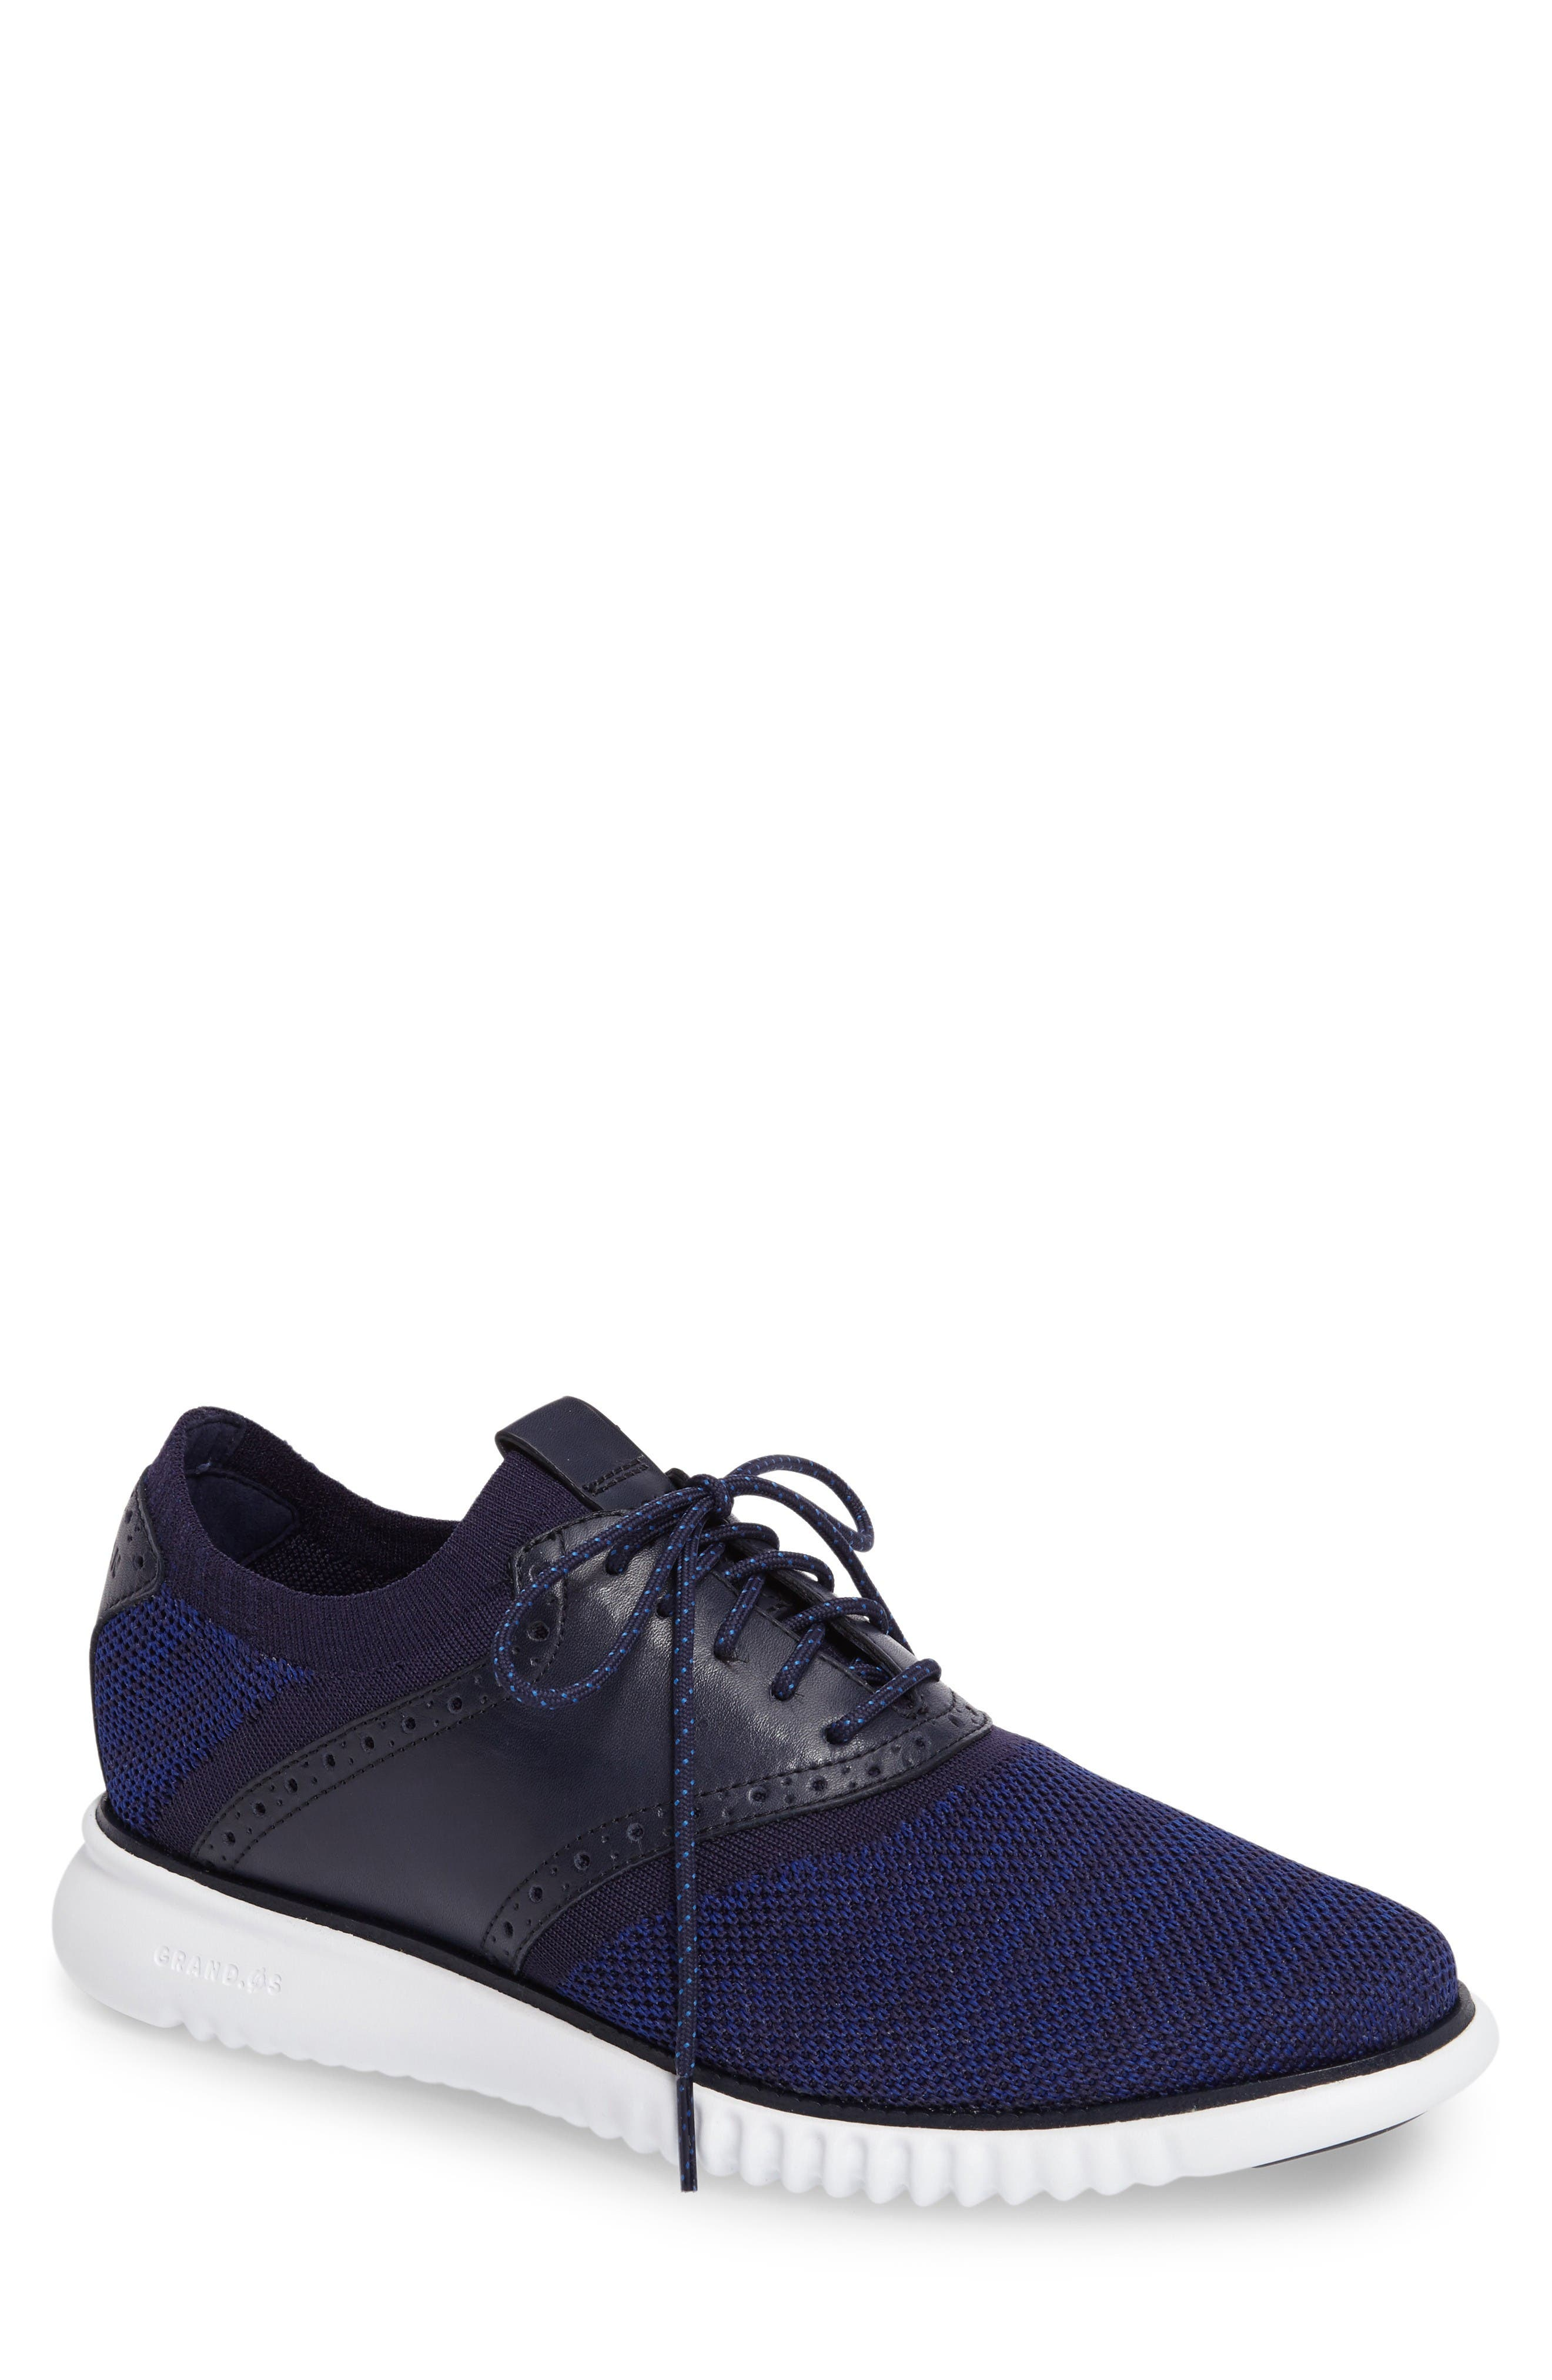 Cole Haan 2.0 Grand Saddle Sneaker (Men)